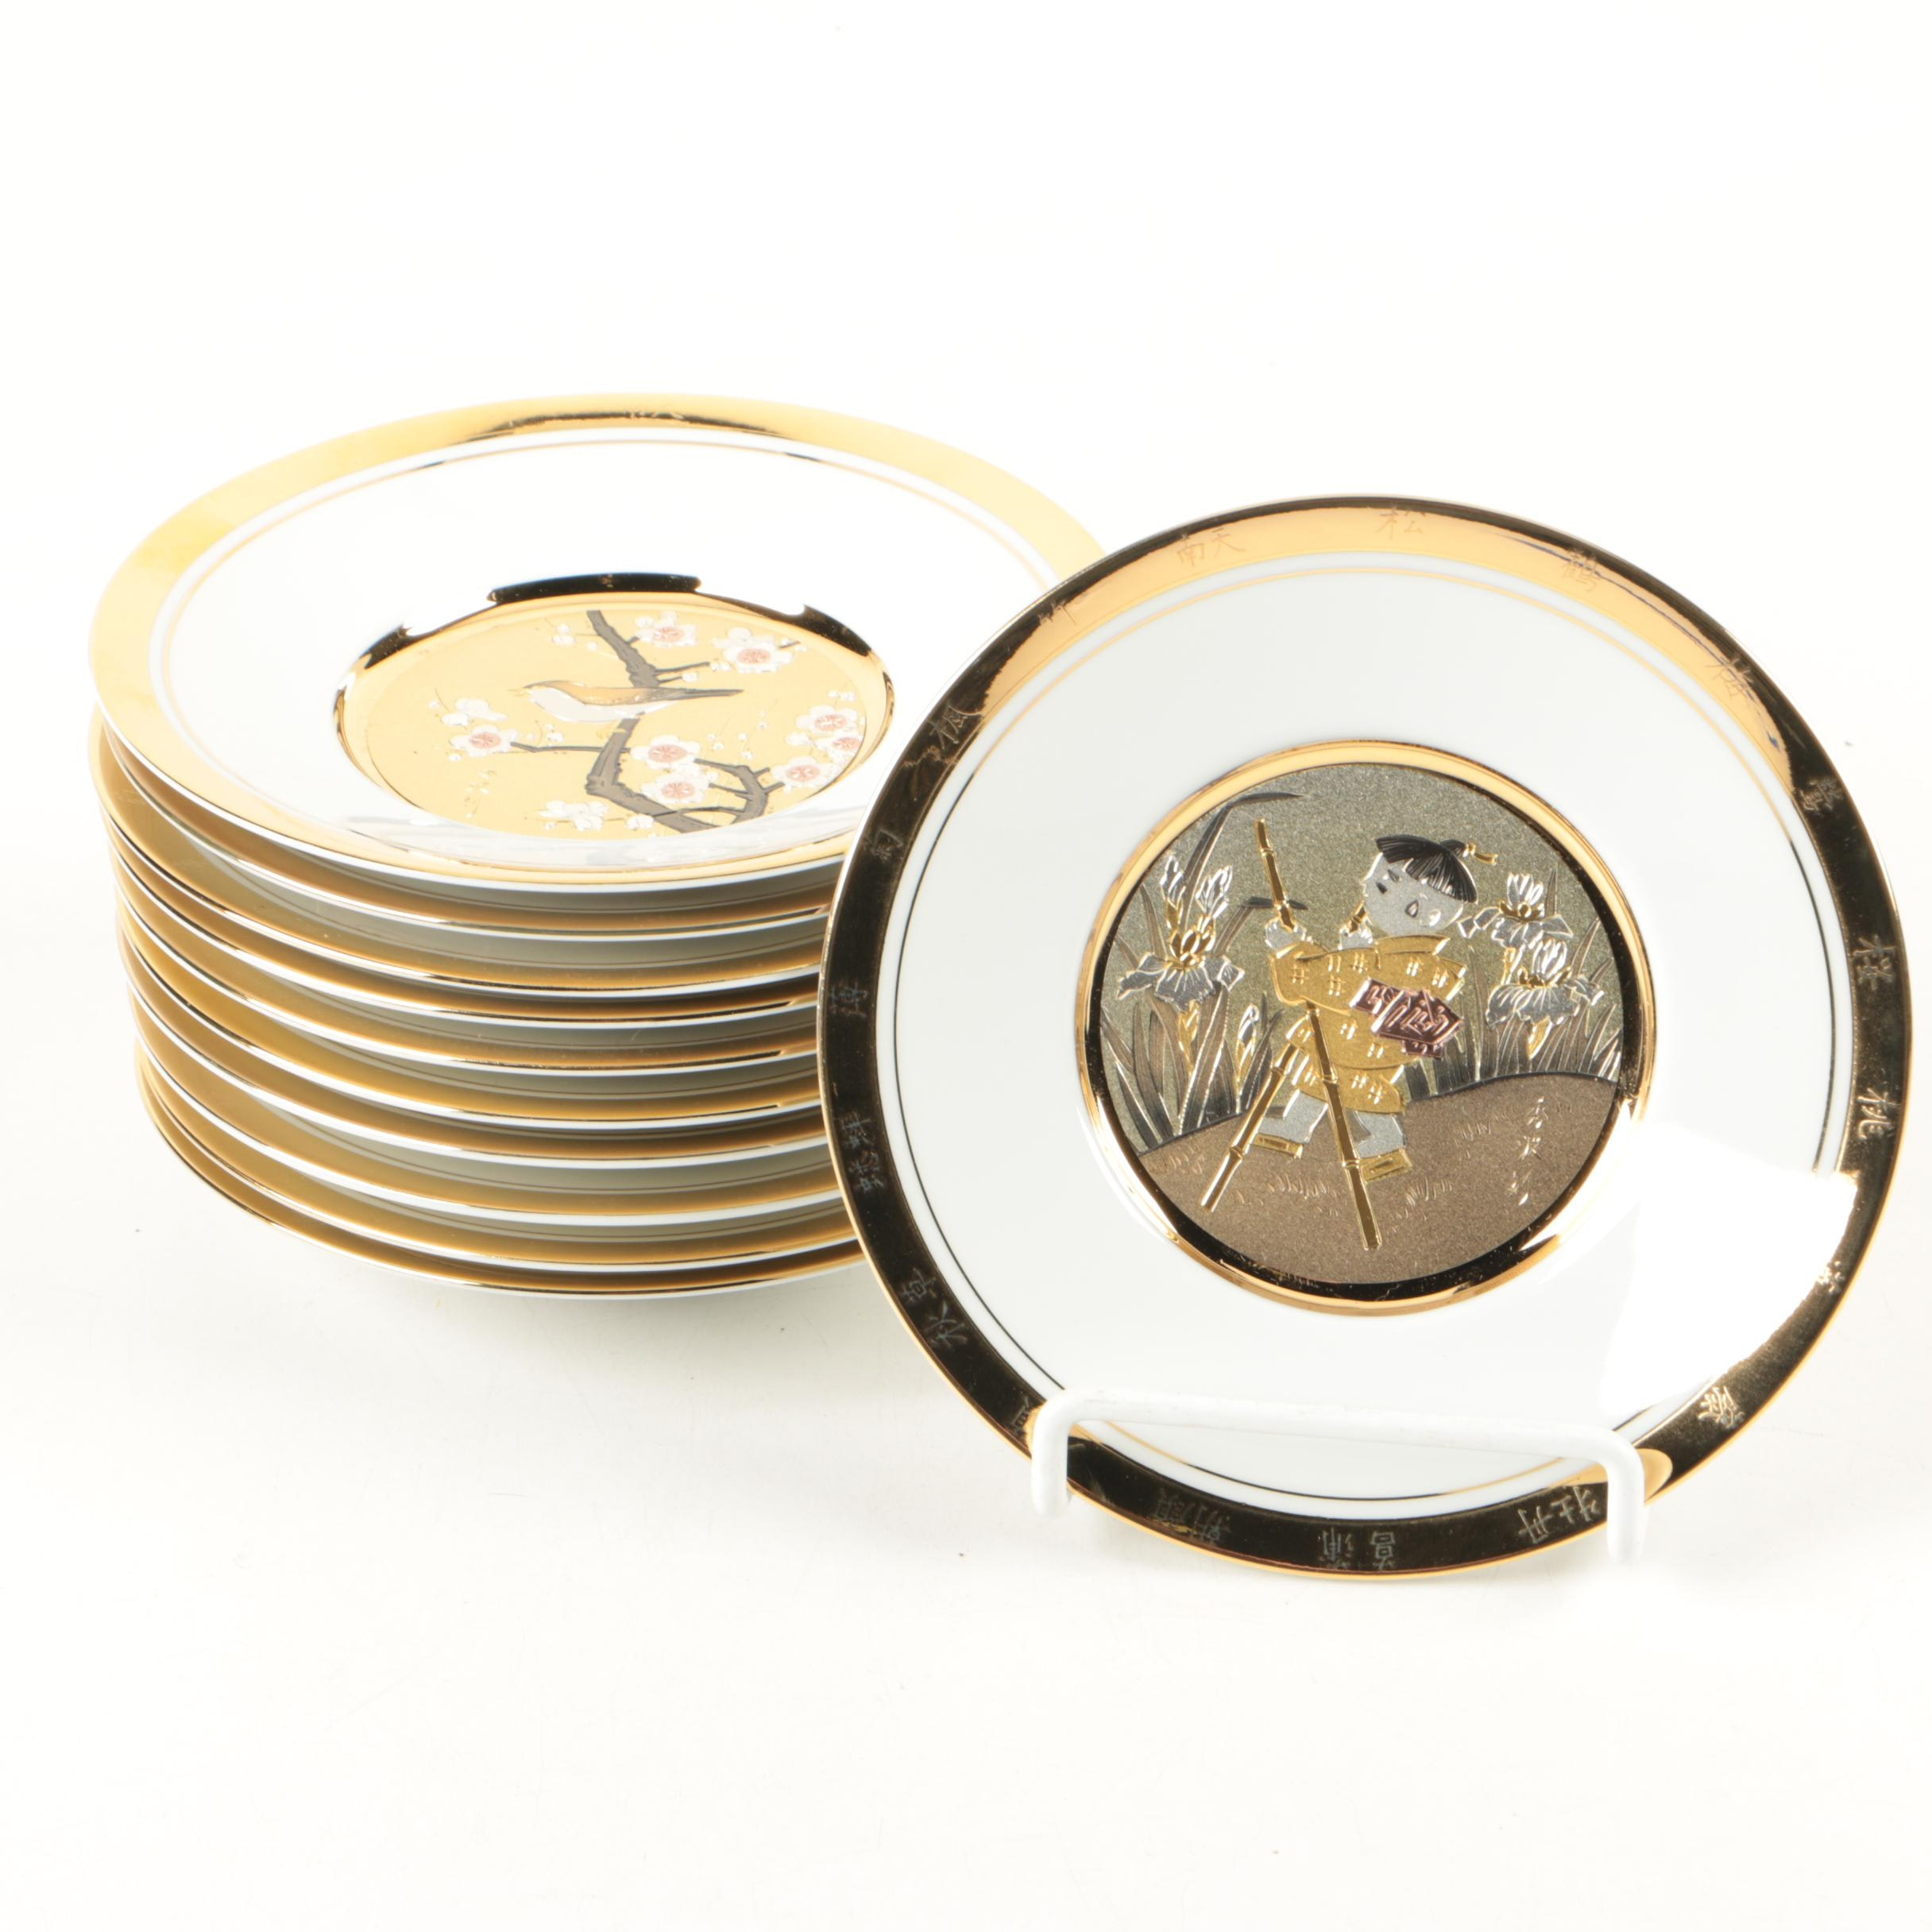 The Hamilton Collection Chokin Style Plates